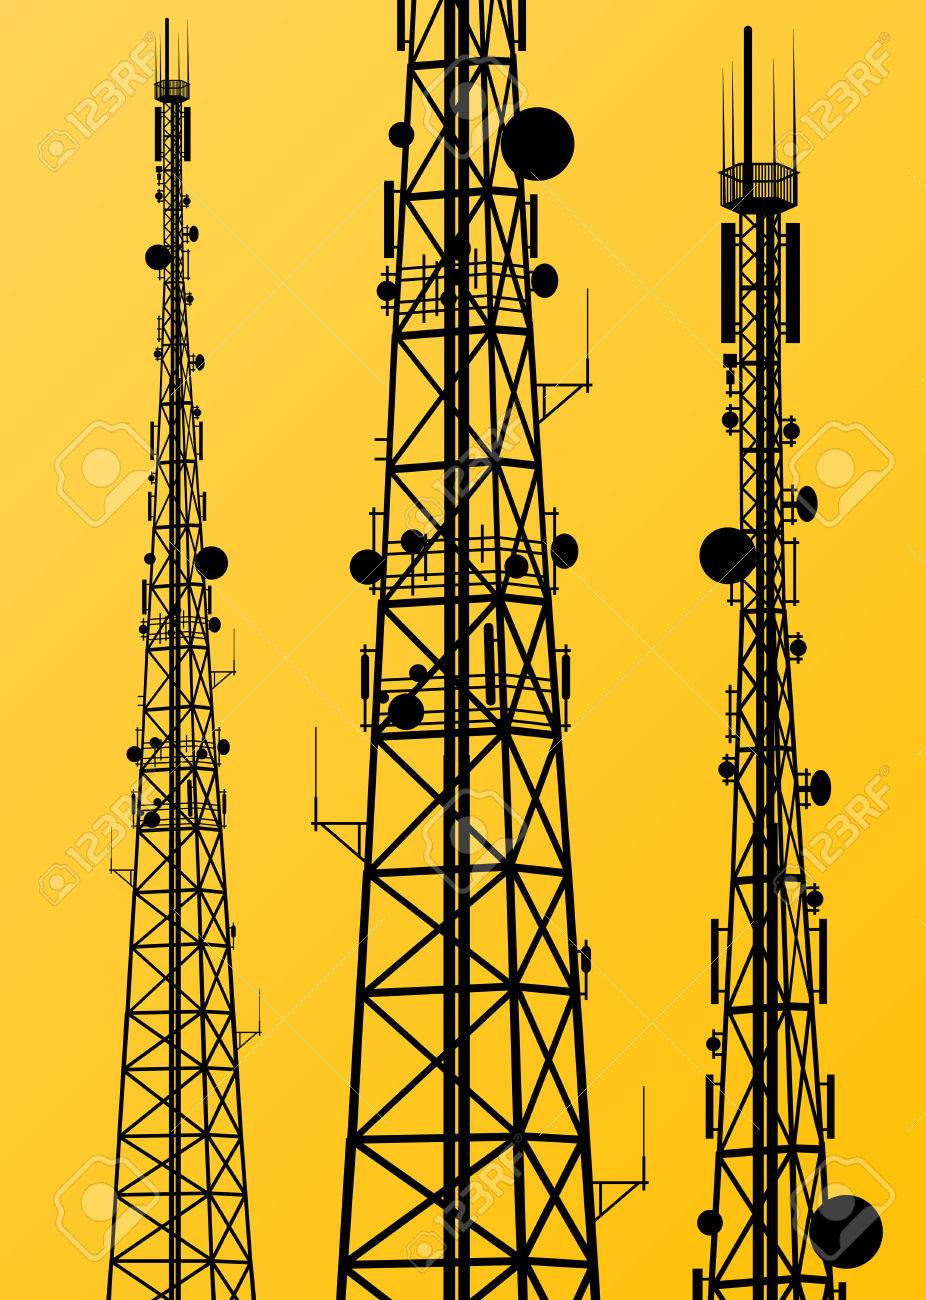 Communication transmission tower radio signal phone antenna vector - 56778729